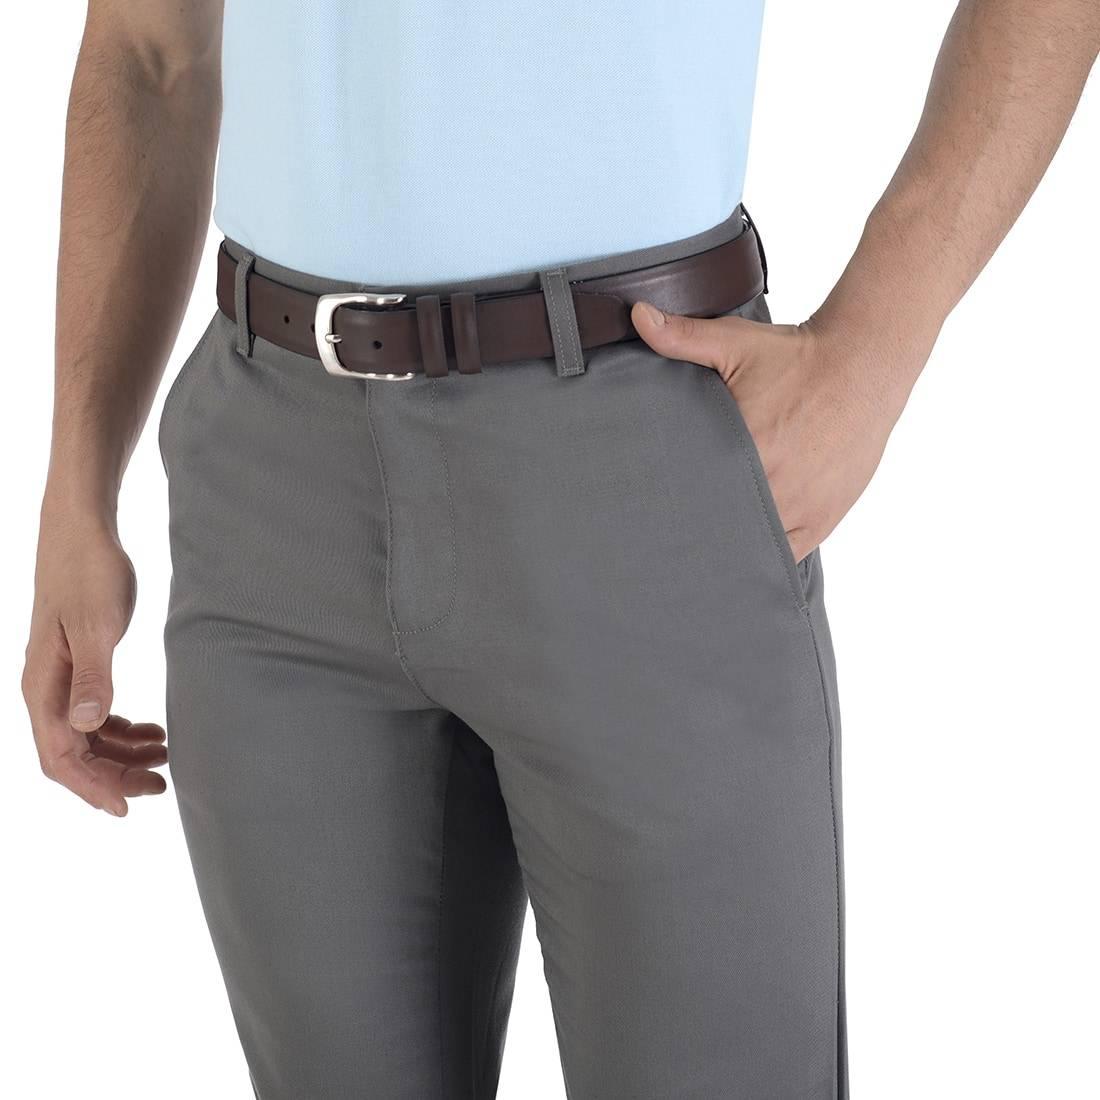 010920418906-03-Pantalon-Casual-Slim-Fit-Oxford-yale